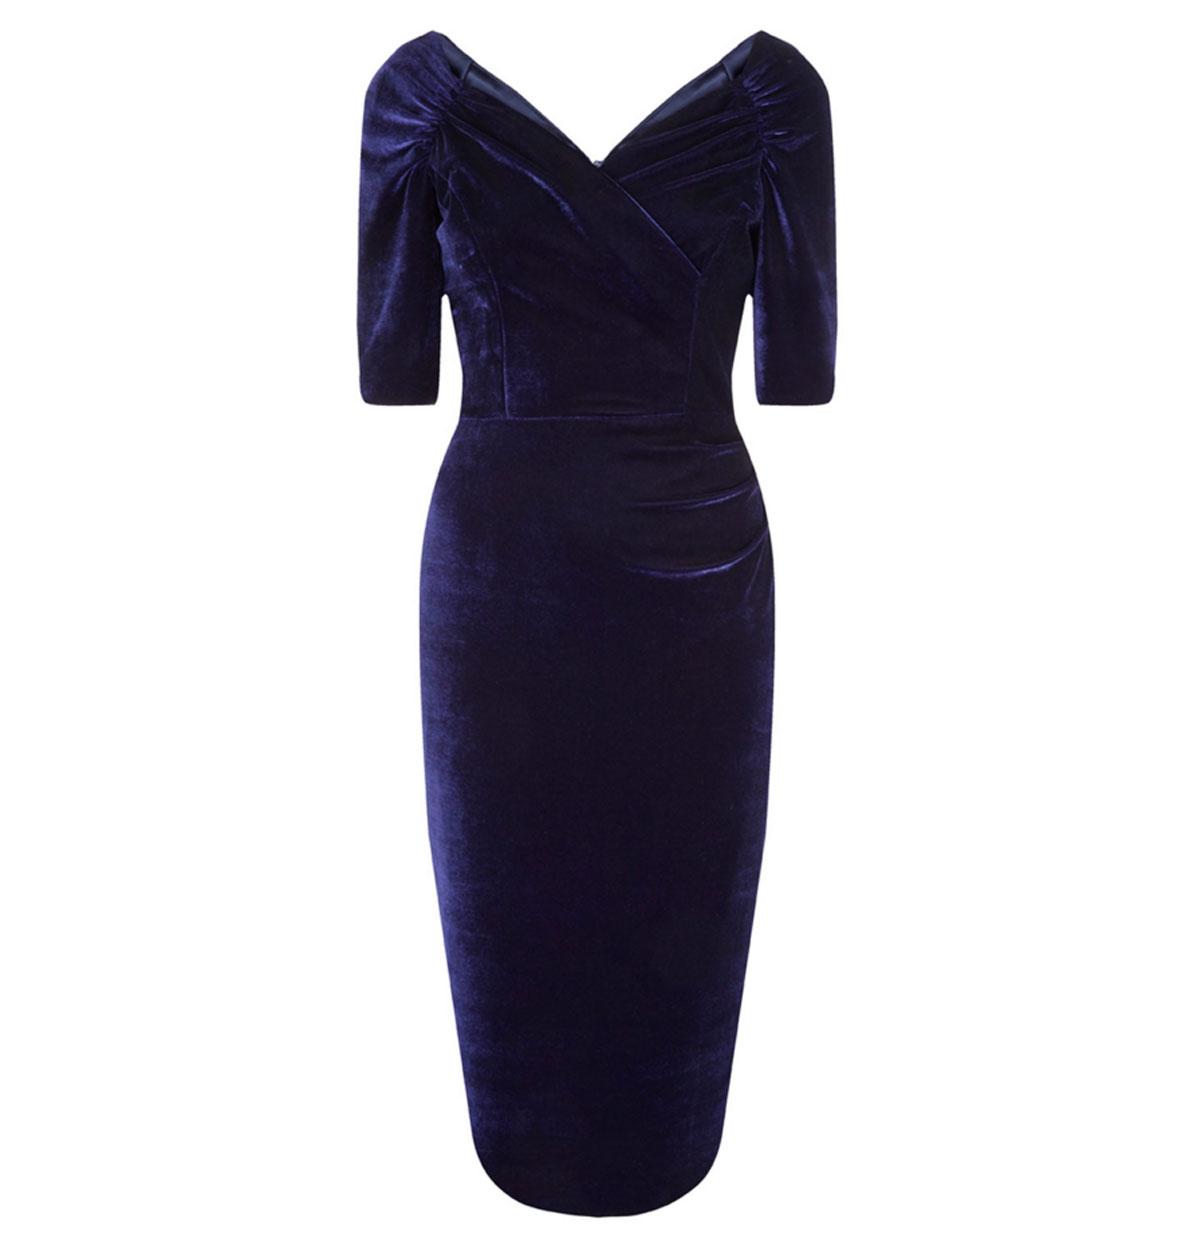 Monte Carlo Velvet Pencil Dress Midnight Blue